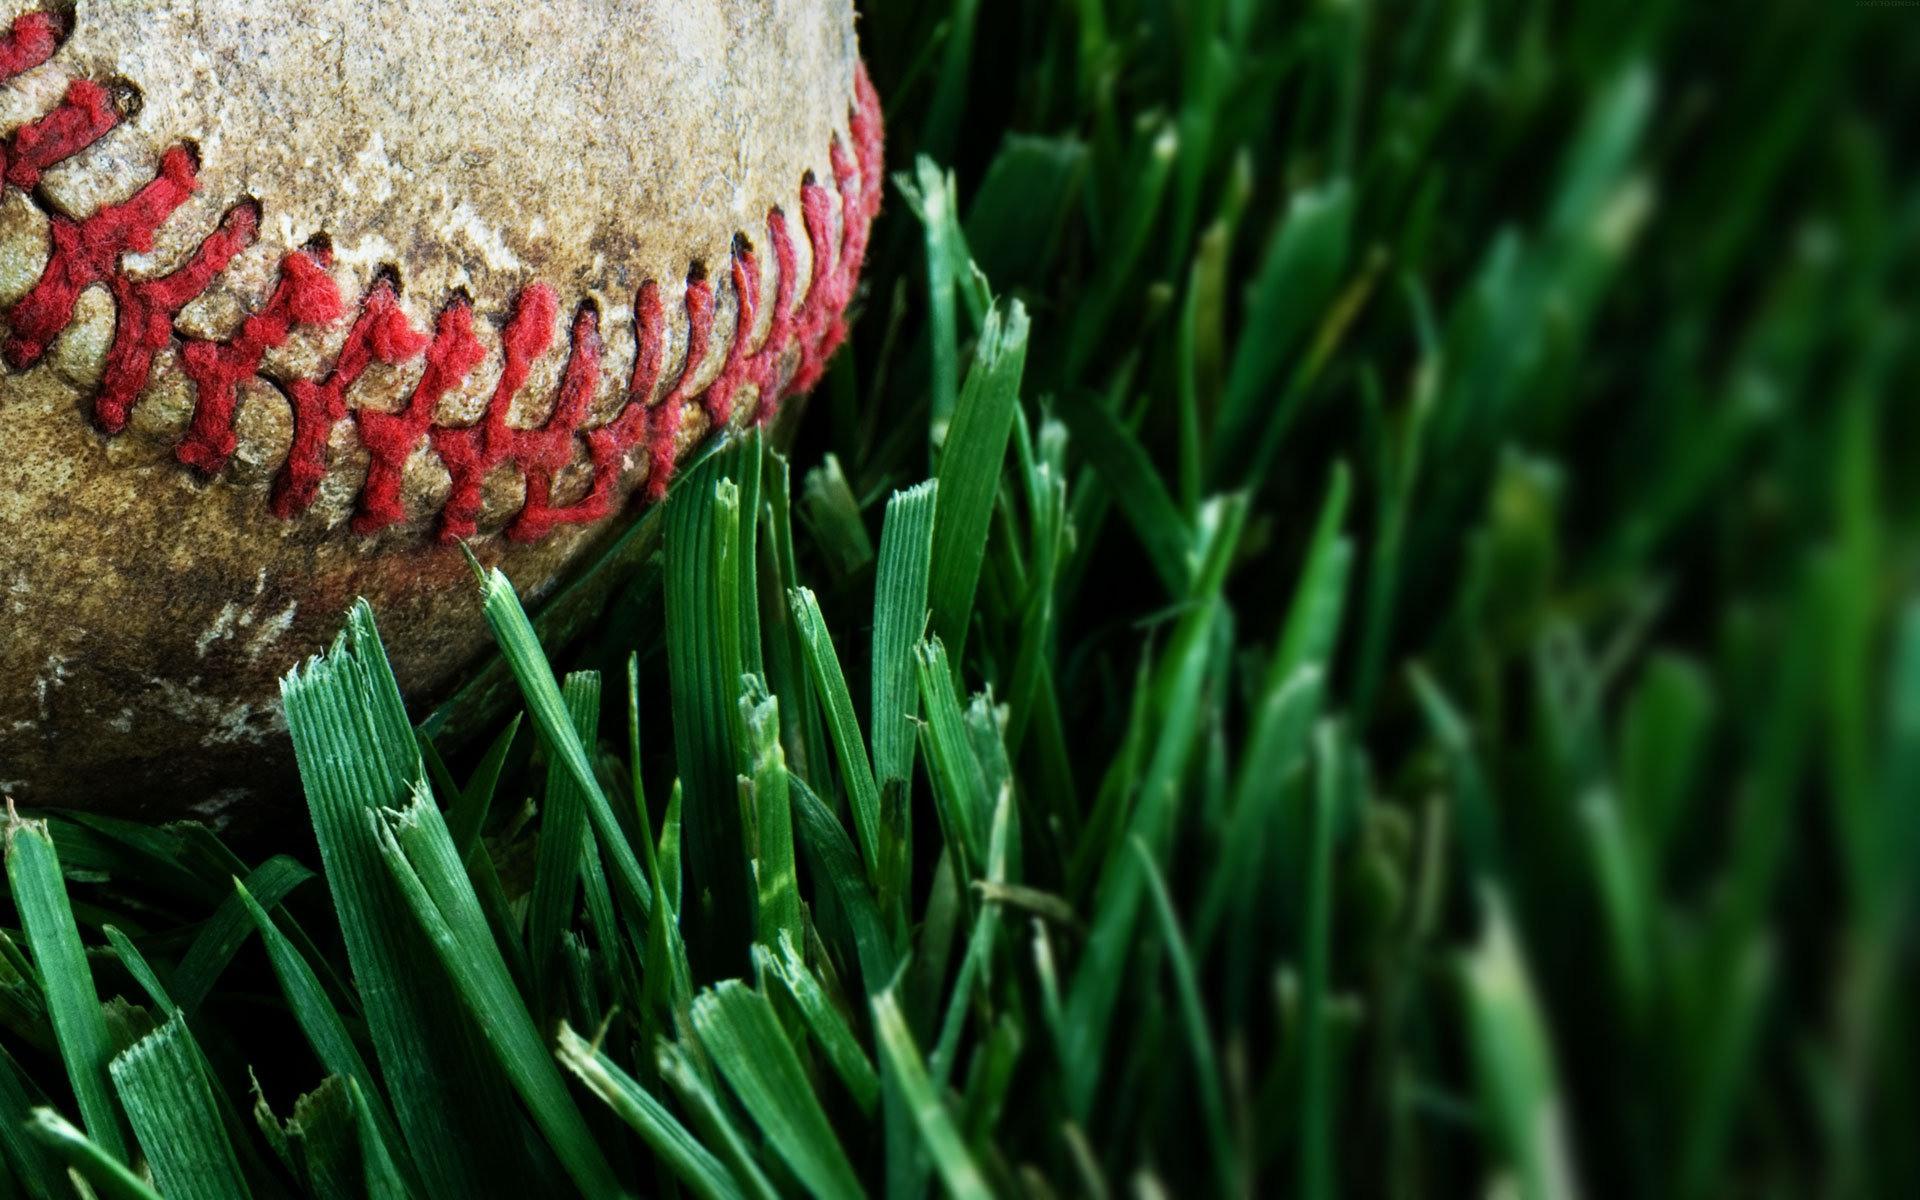 hd desktop wallpaper baseball - photo #46